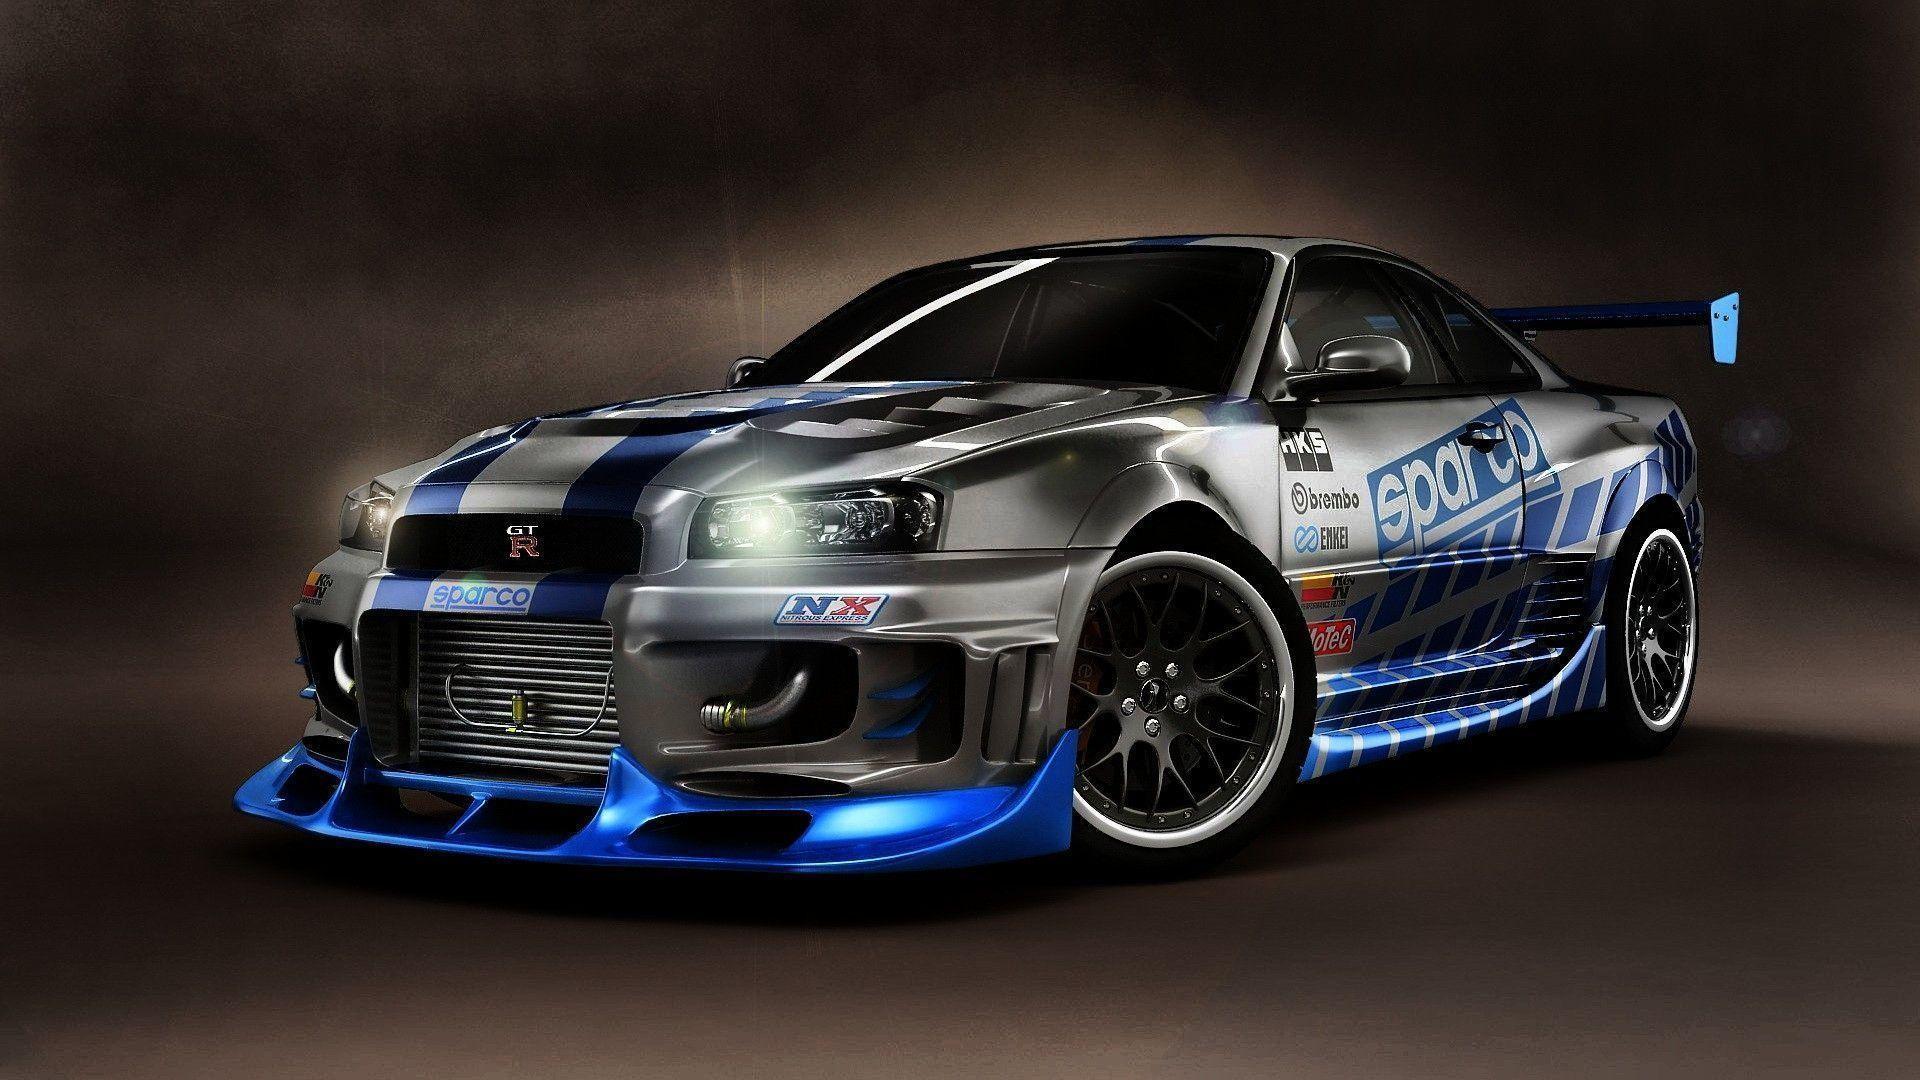 Paul Walker Blue Car Wallpaper Nissan Skyline Gt R R34 Wallpapers 70 Images